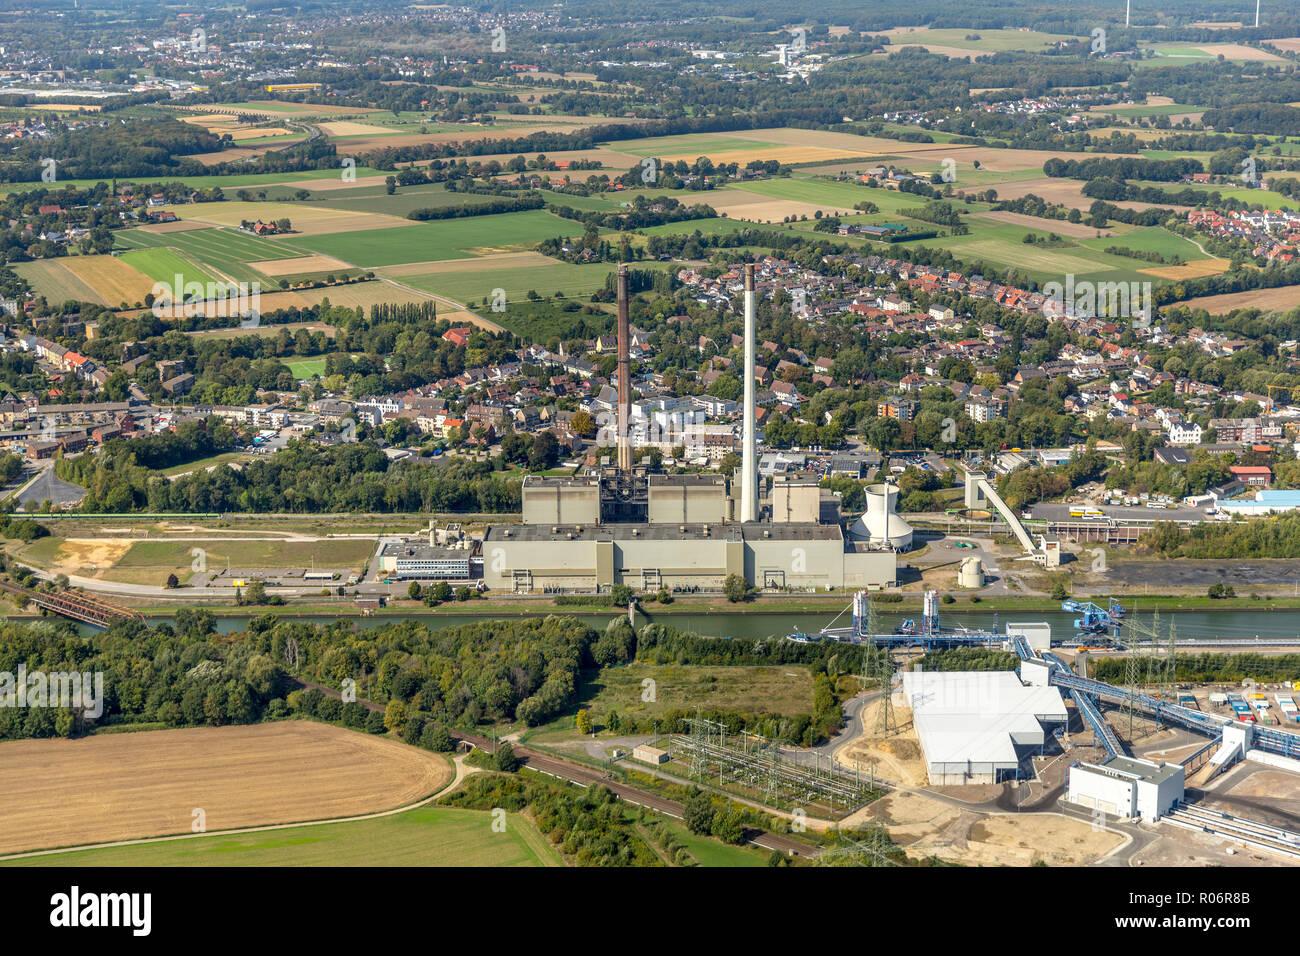 Aerial photograph, Uniper coal power plant,old powerplant EON Datteln 2,  former E.ON Datteln4 power station on the Dortmund-Ems Canal, Emscher-Lippe, Stock Photo